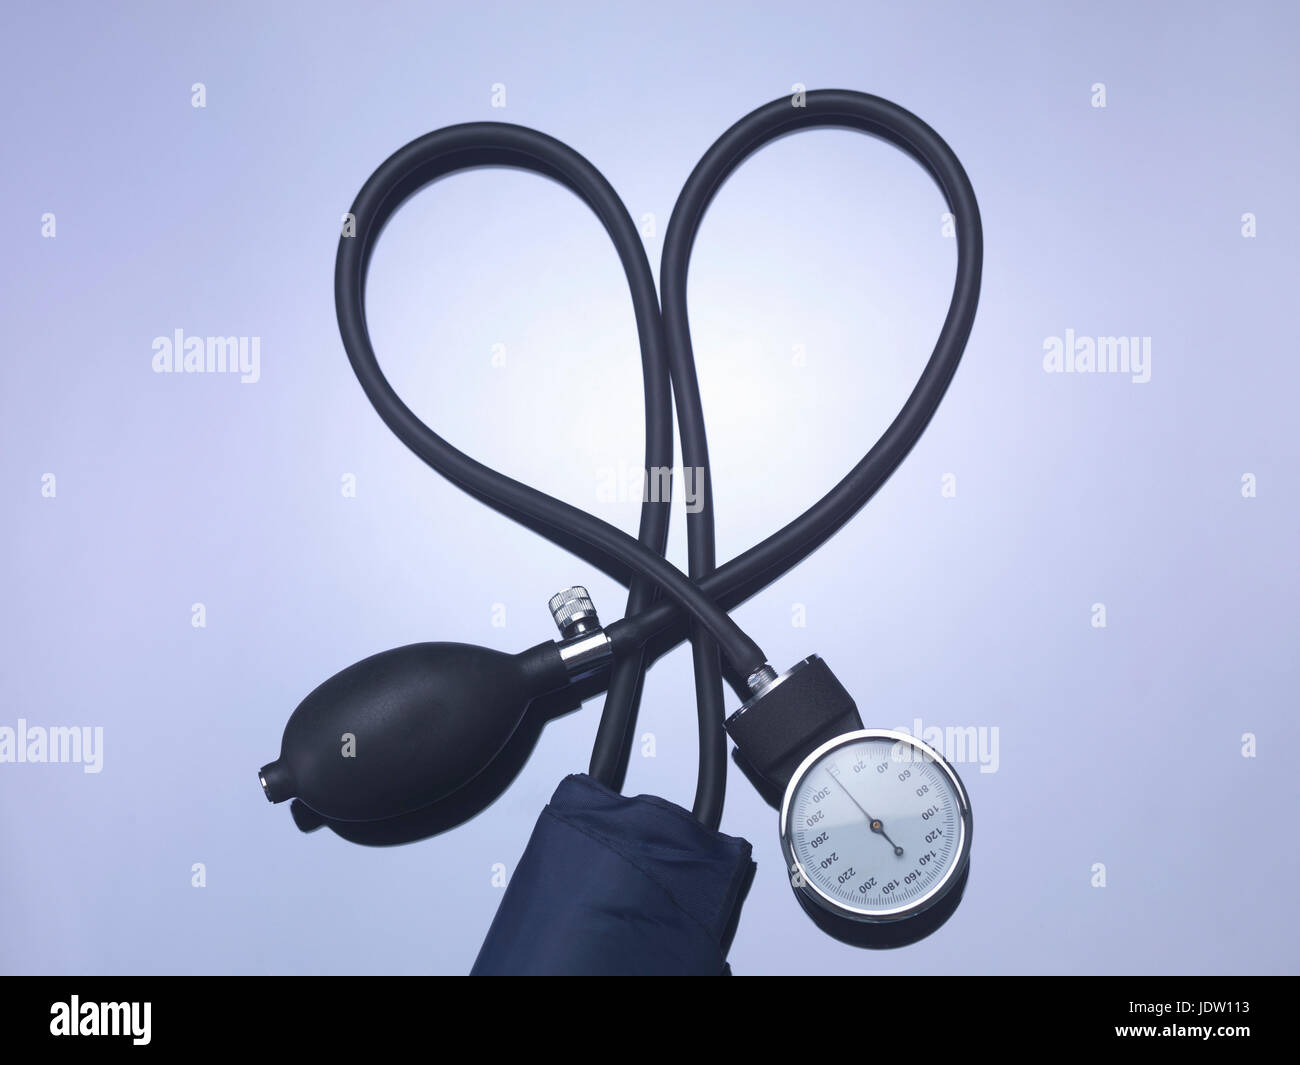 Close up of blood pressure gauge - Stock Image